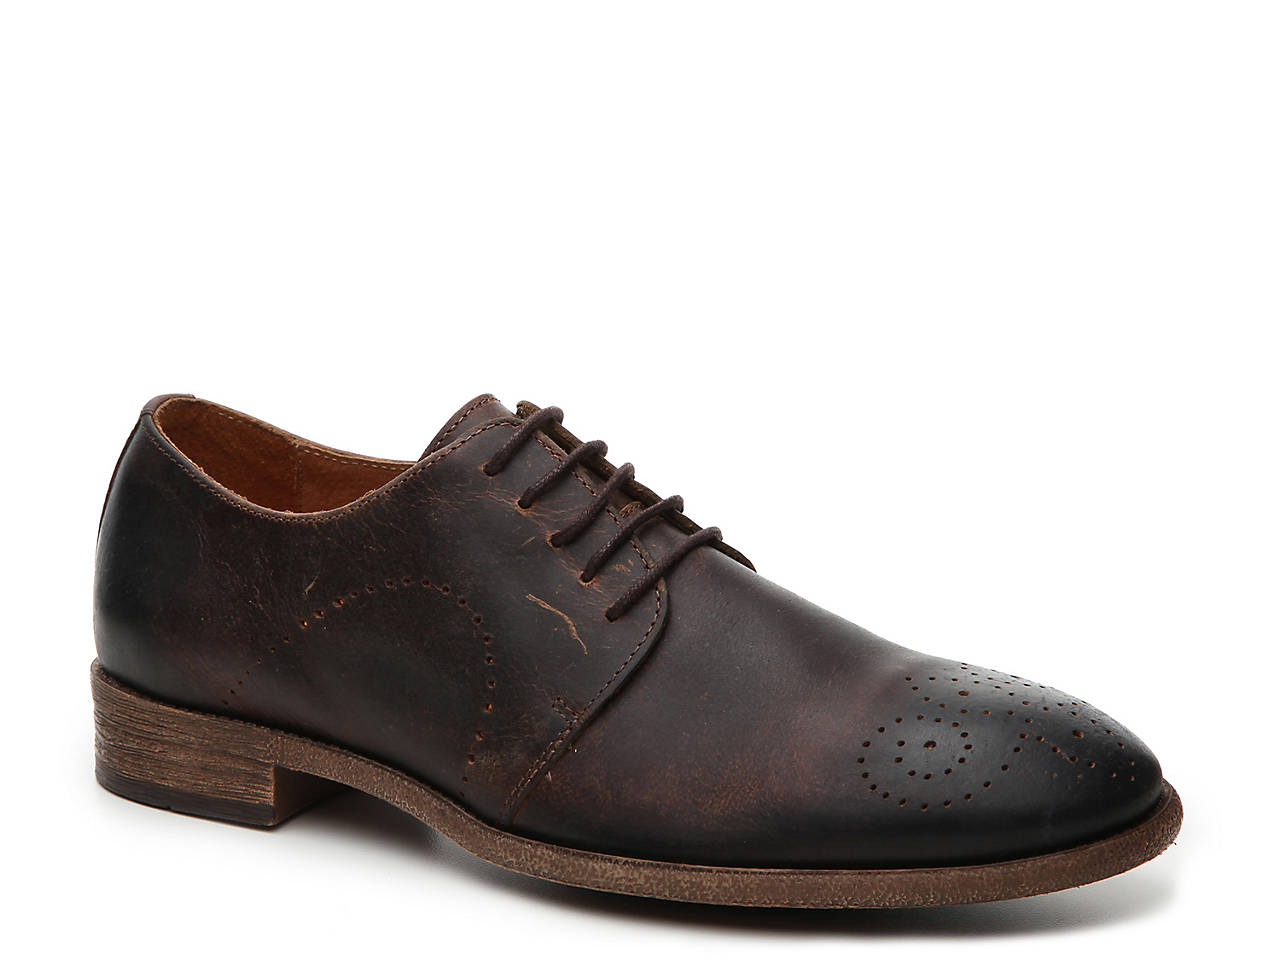 Robert Wayne Utah Oxford Dress Shoe sVh2ldjby